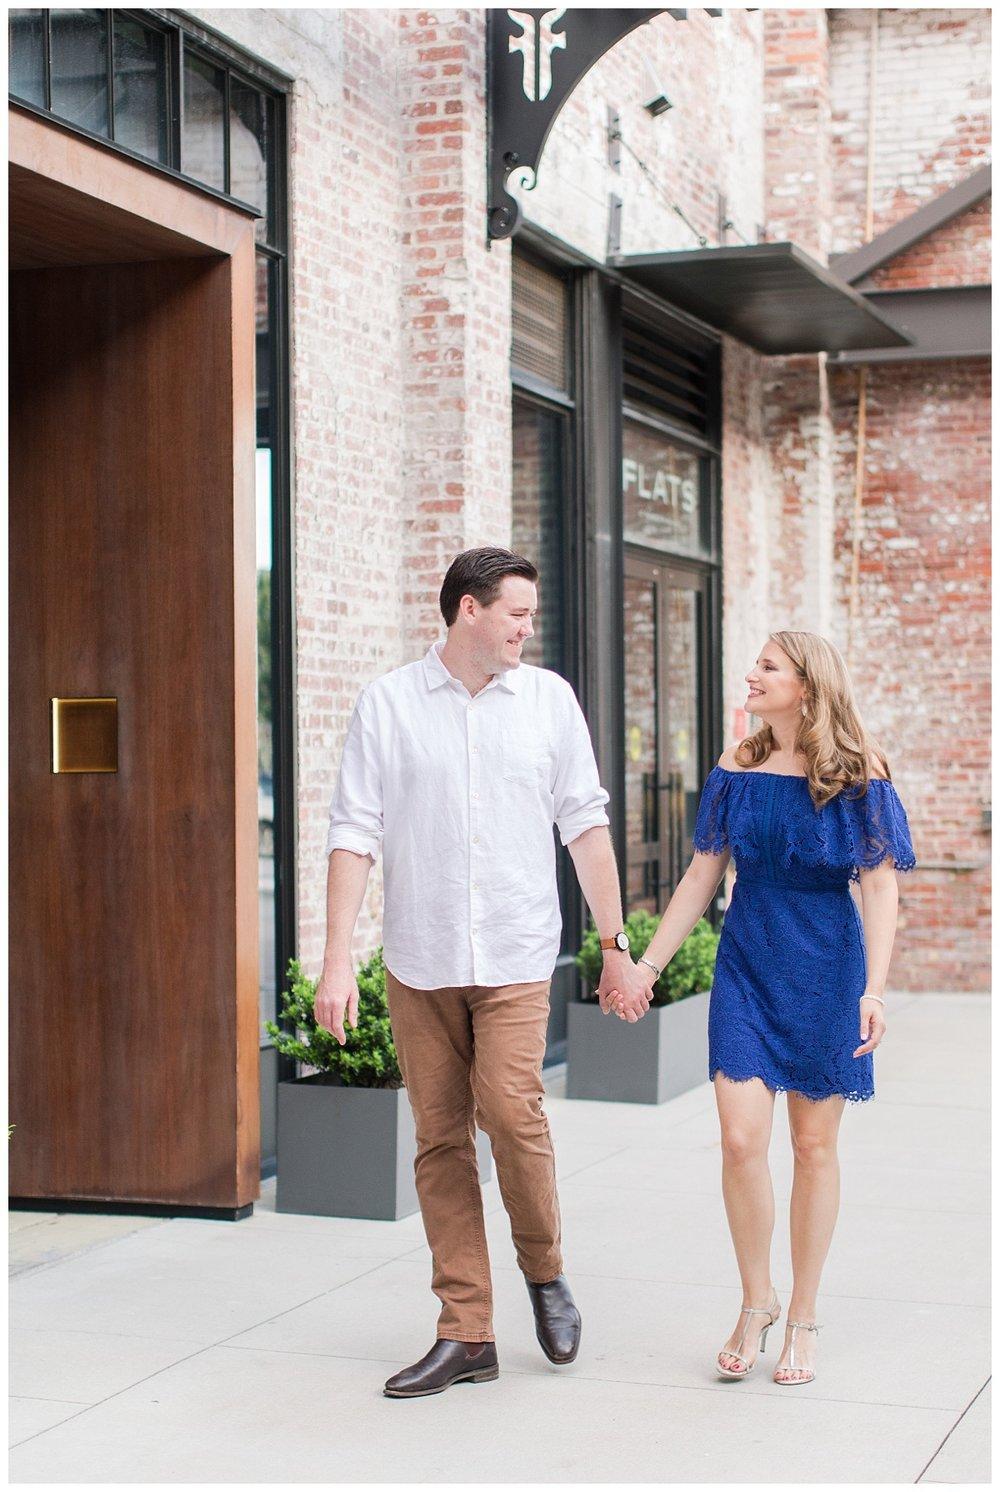 Engagement Pictures_KIm and Hamish_Abby Breaux Photography_Atlanta_Ponce City Market_Jackson Street Bridge_0005.jpg